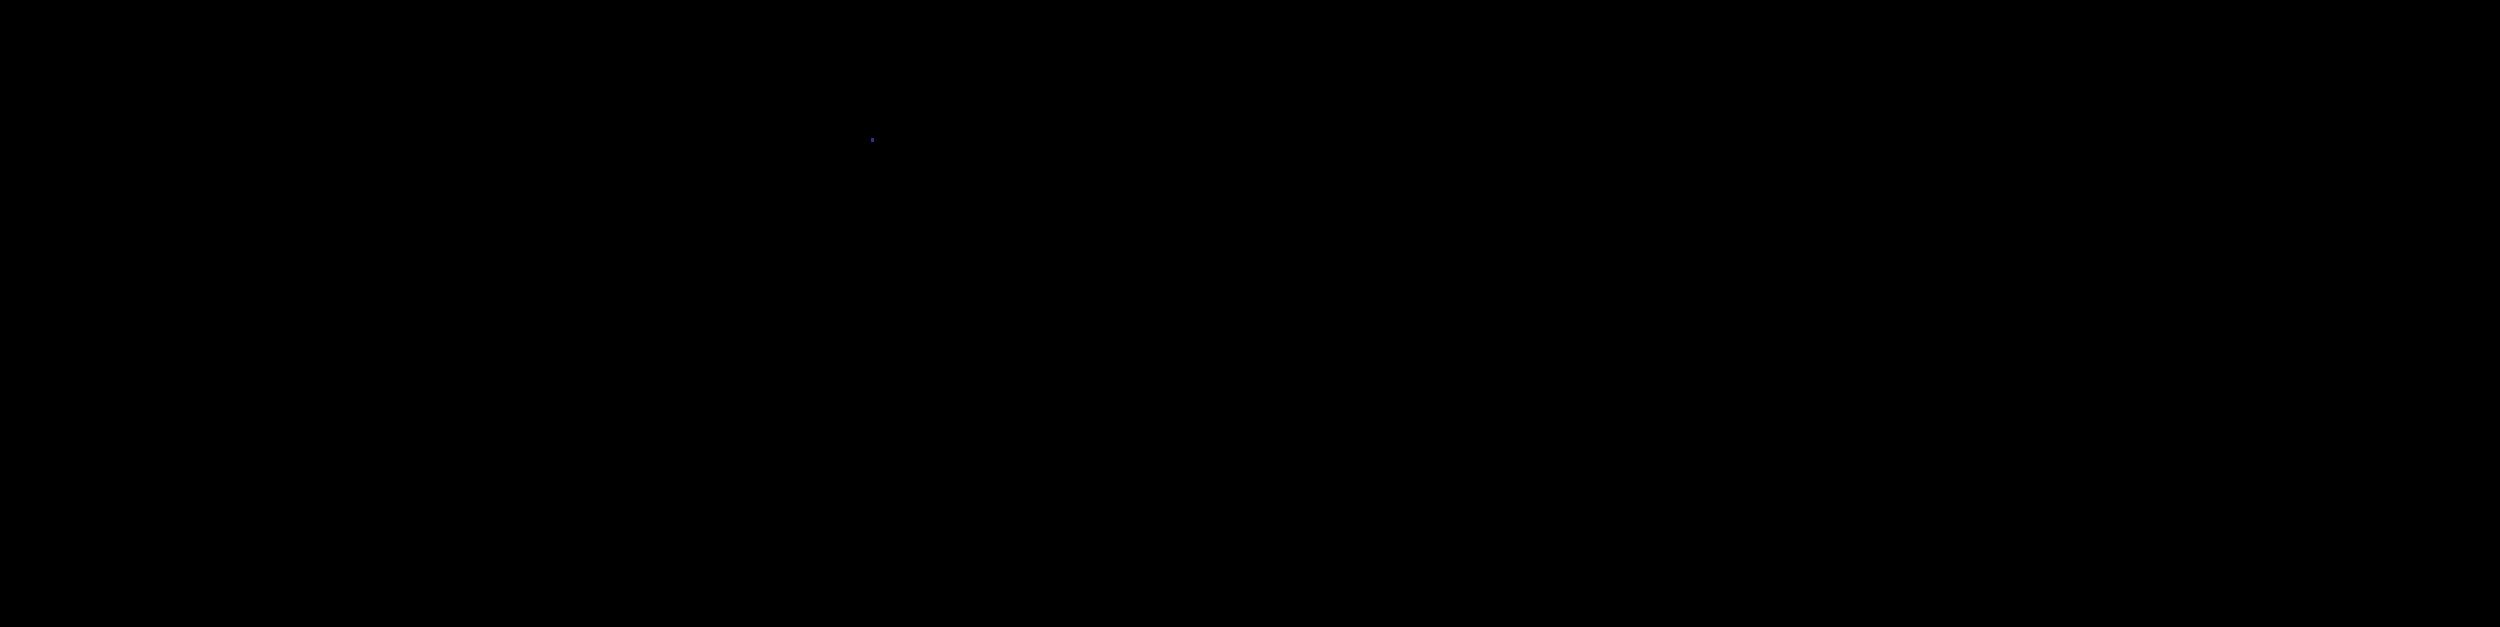 Grey wolf logo black.png